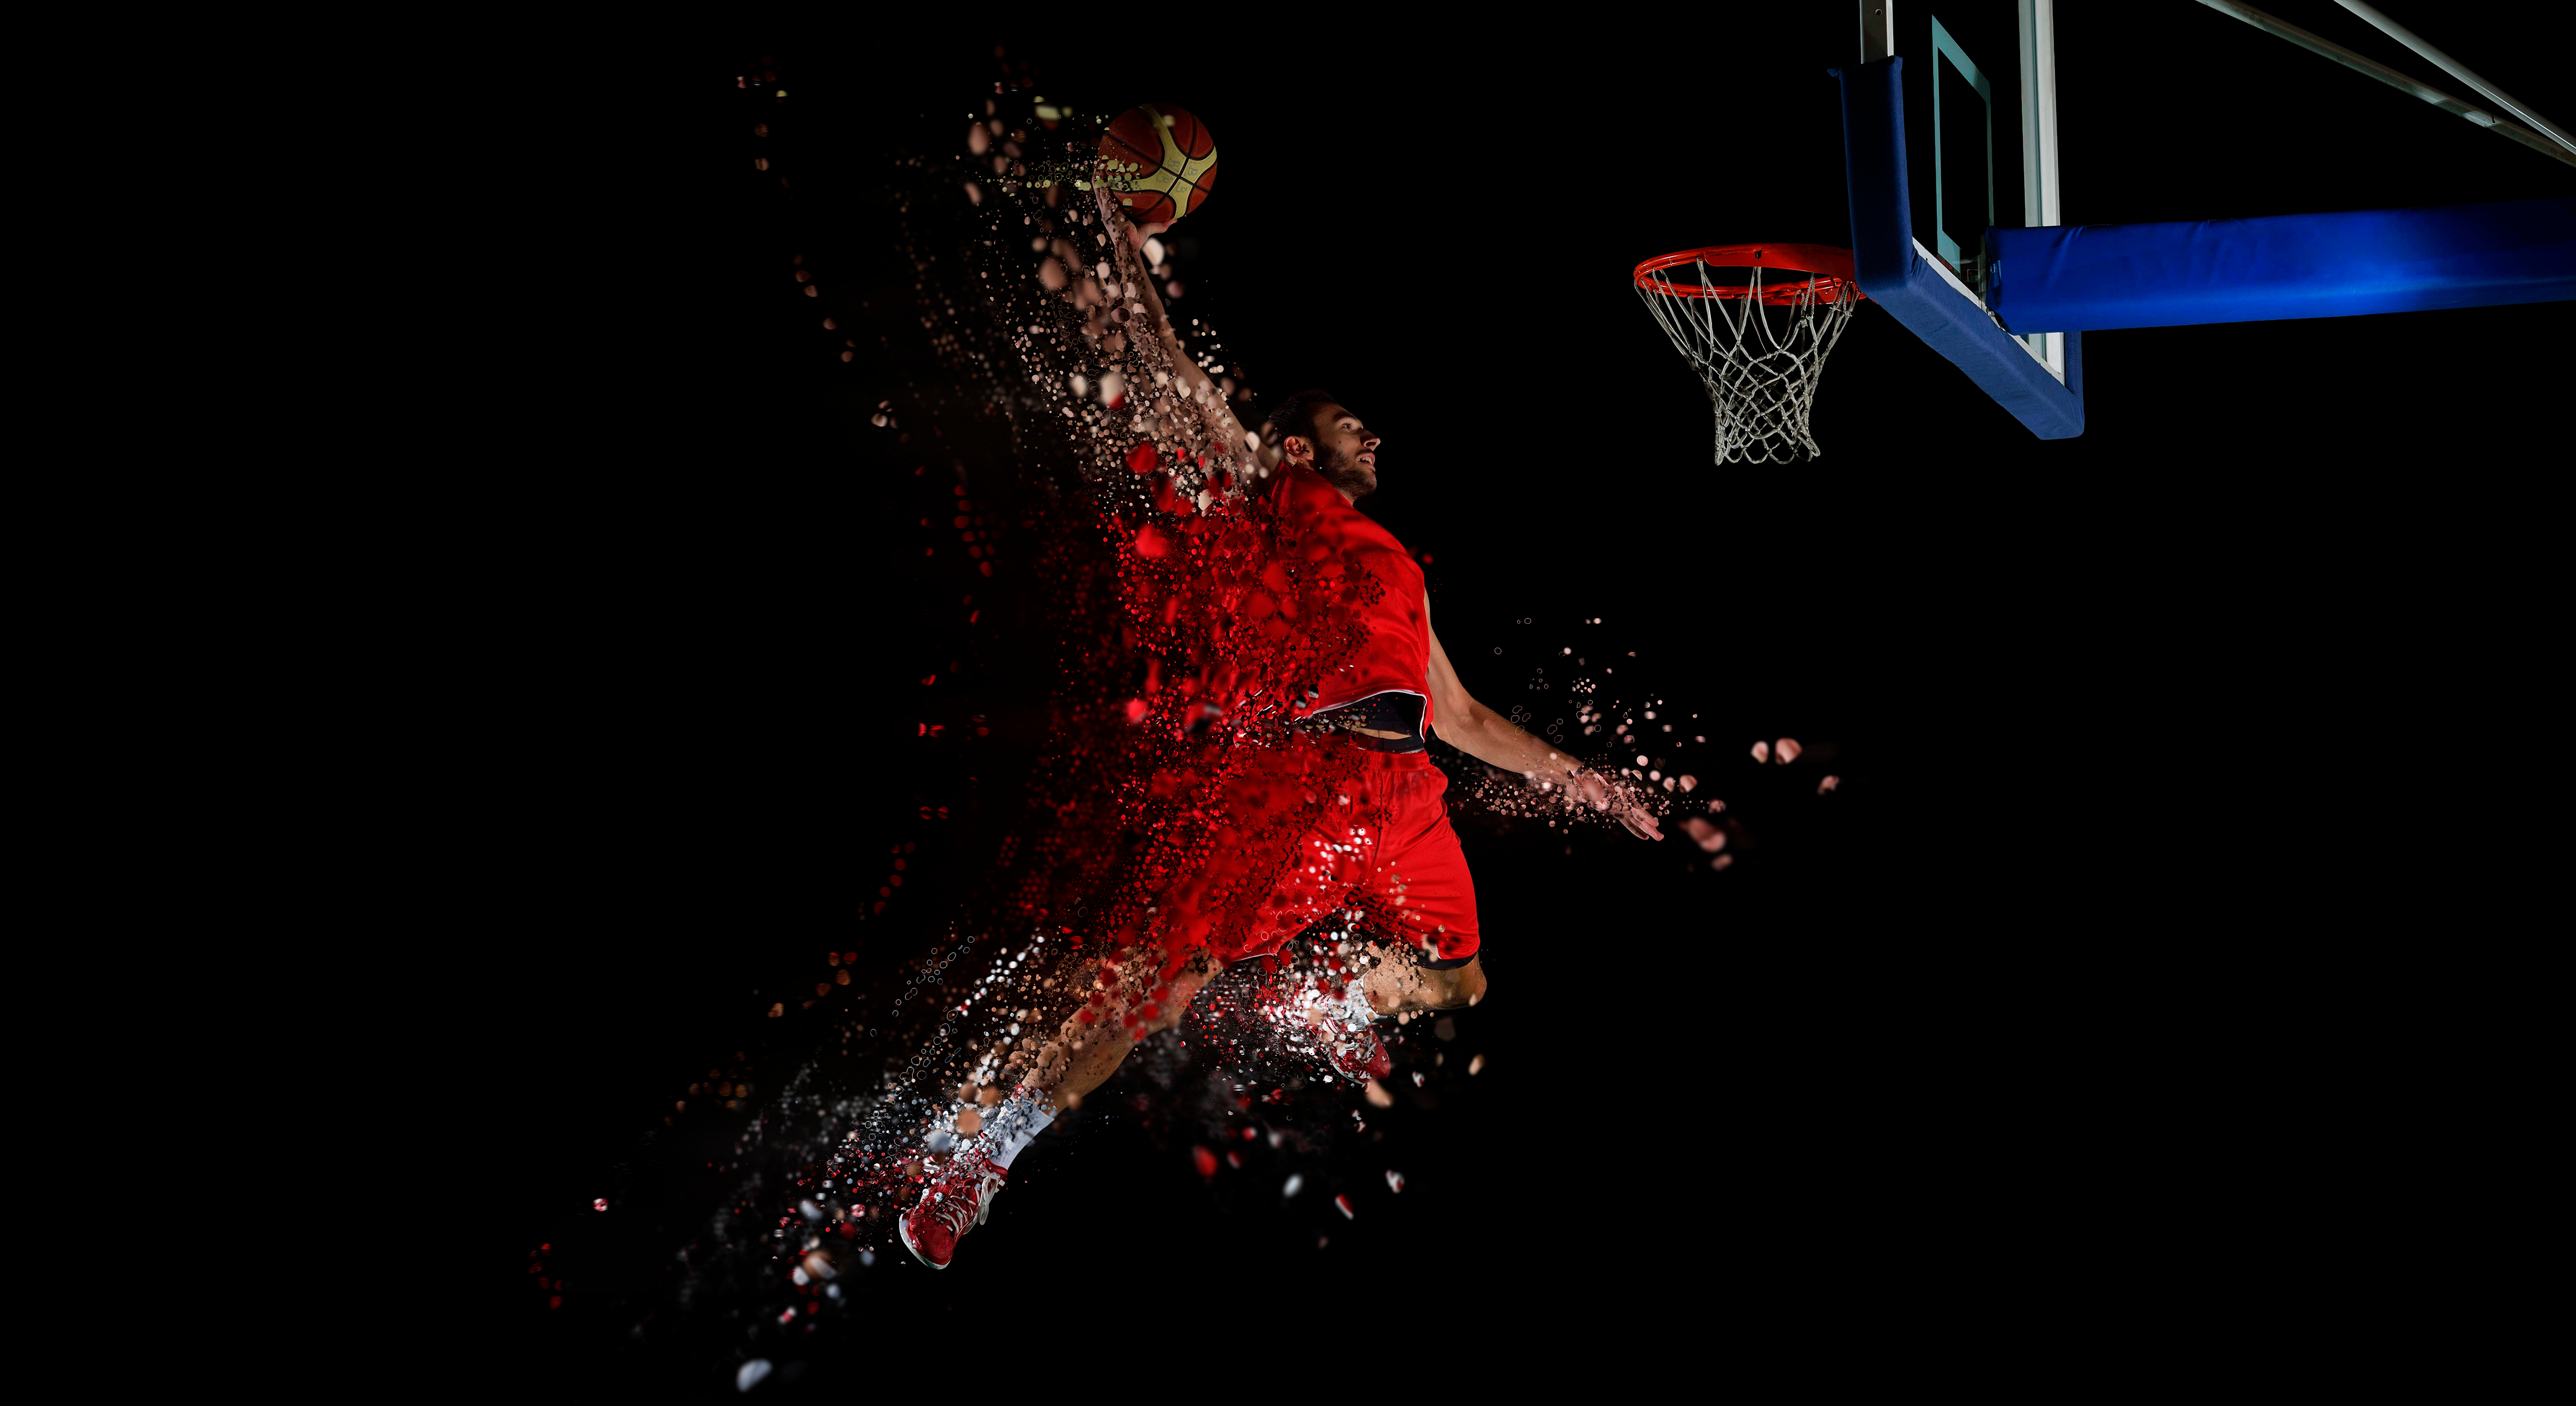 I love basketball wallpapers